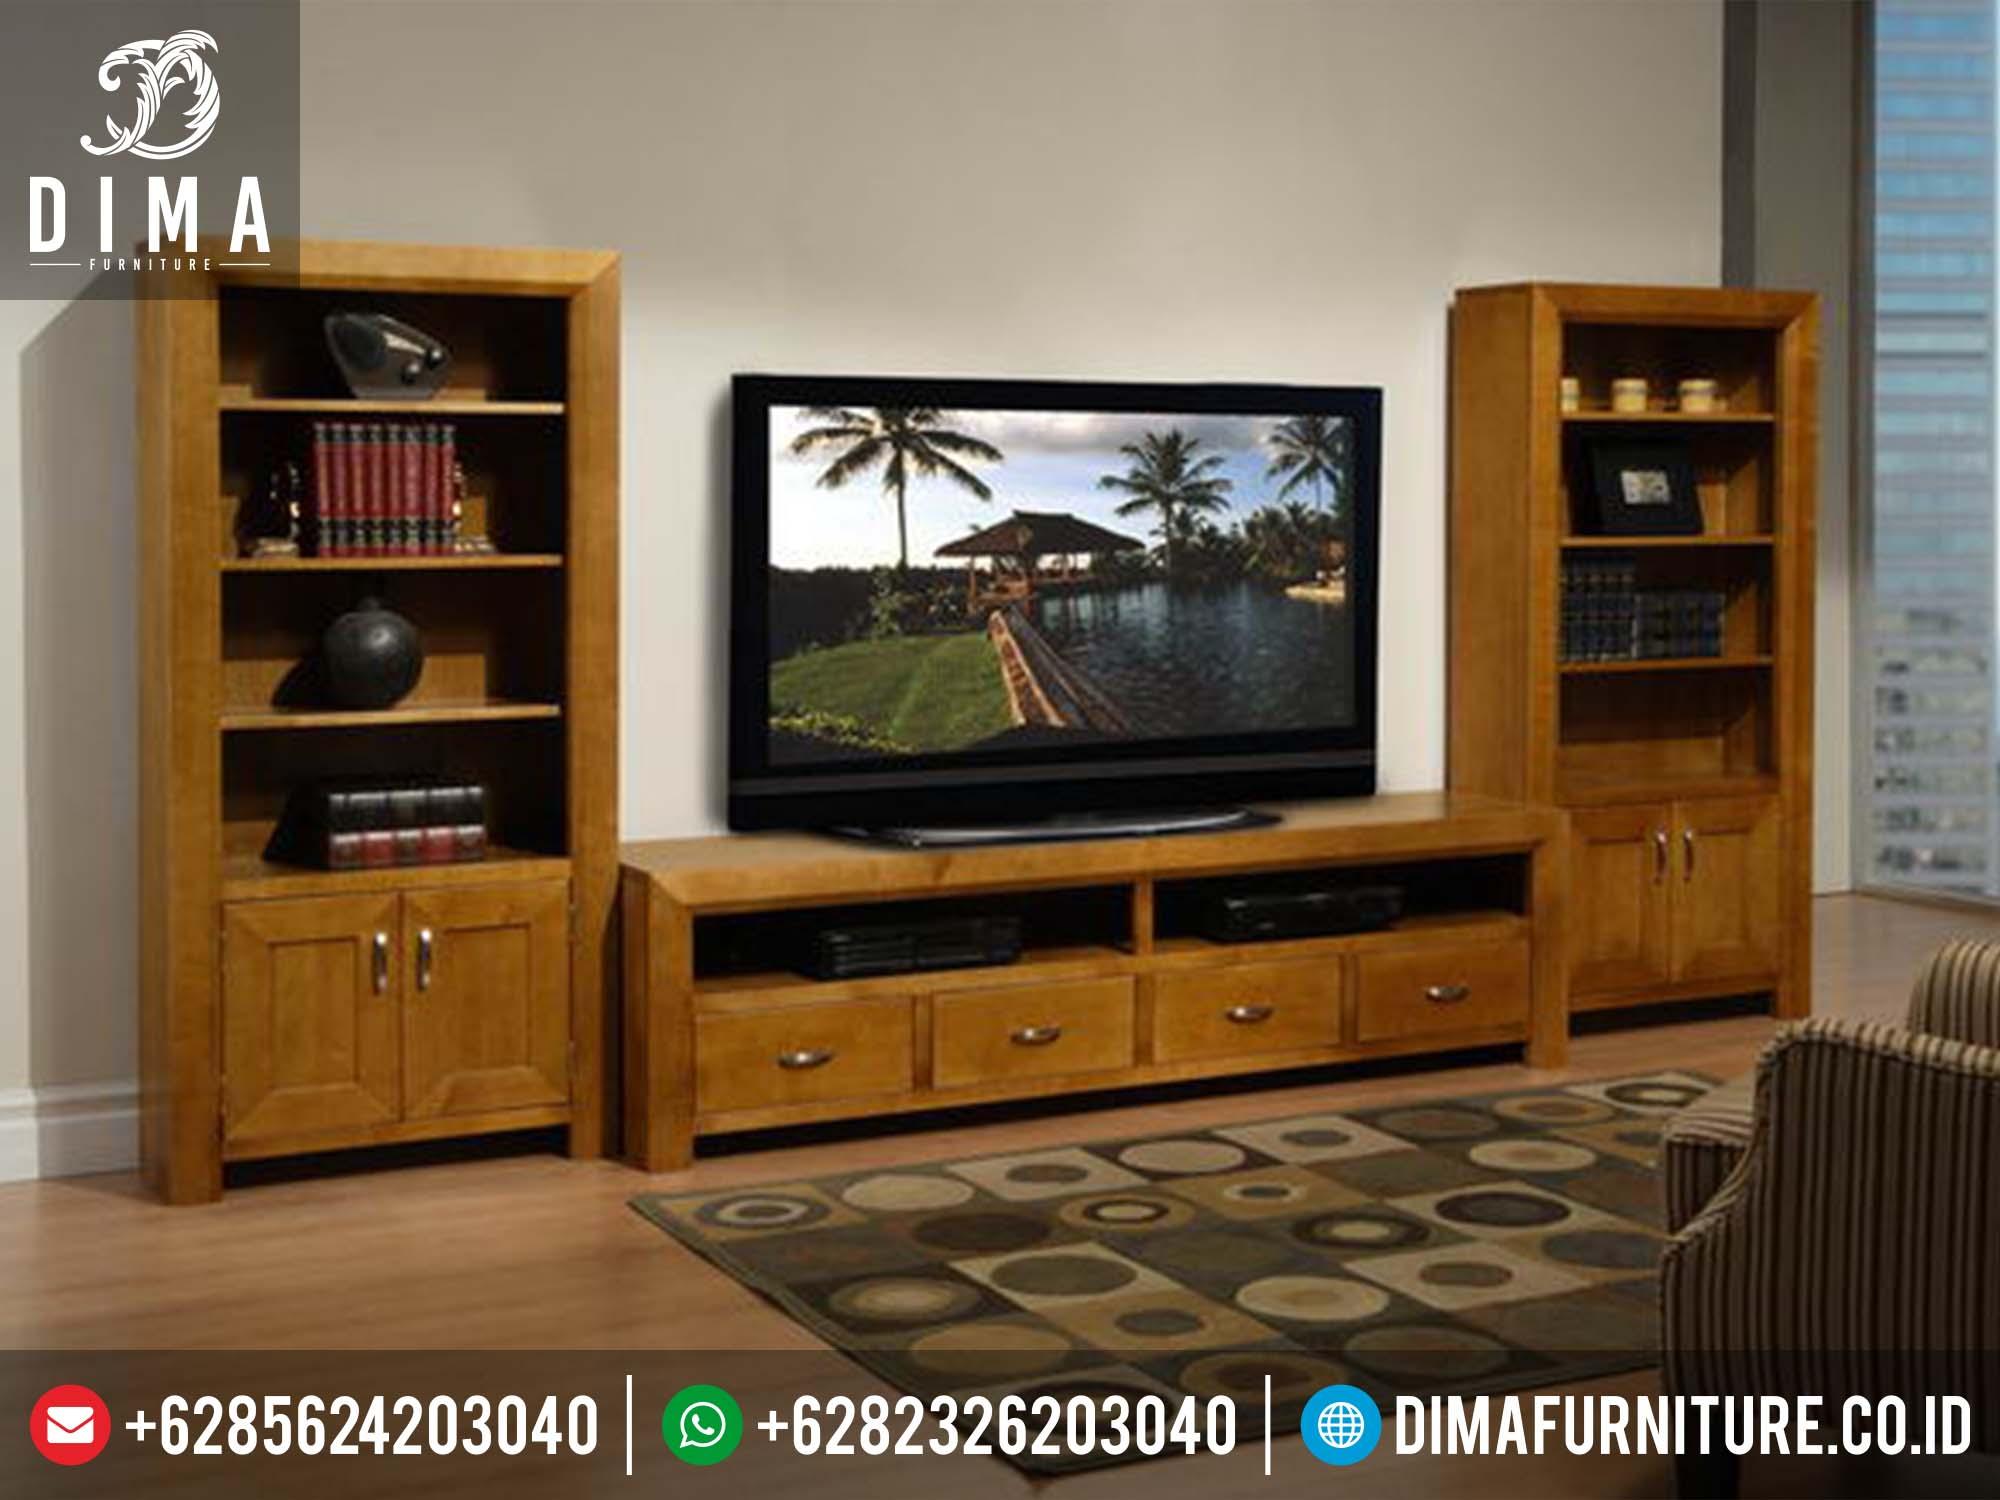 Bufet TV Minimalis Jepara, Bufet TV Minimalis Terbaru, Bufet Minimalis Modern, Bufet TV Minimalis Jati, Bufet TV Minimalis Murah DF-0097